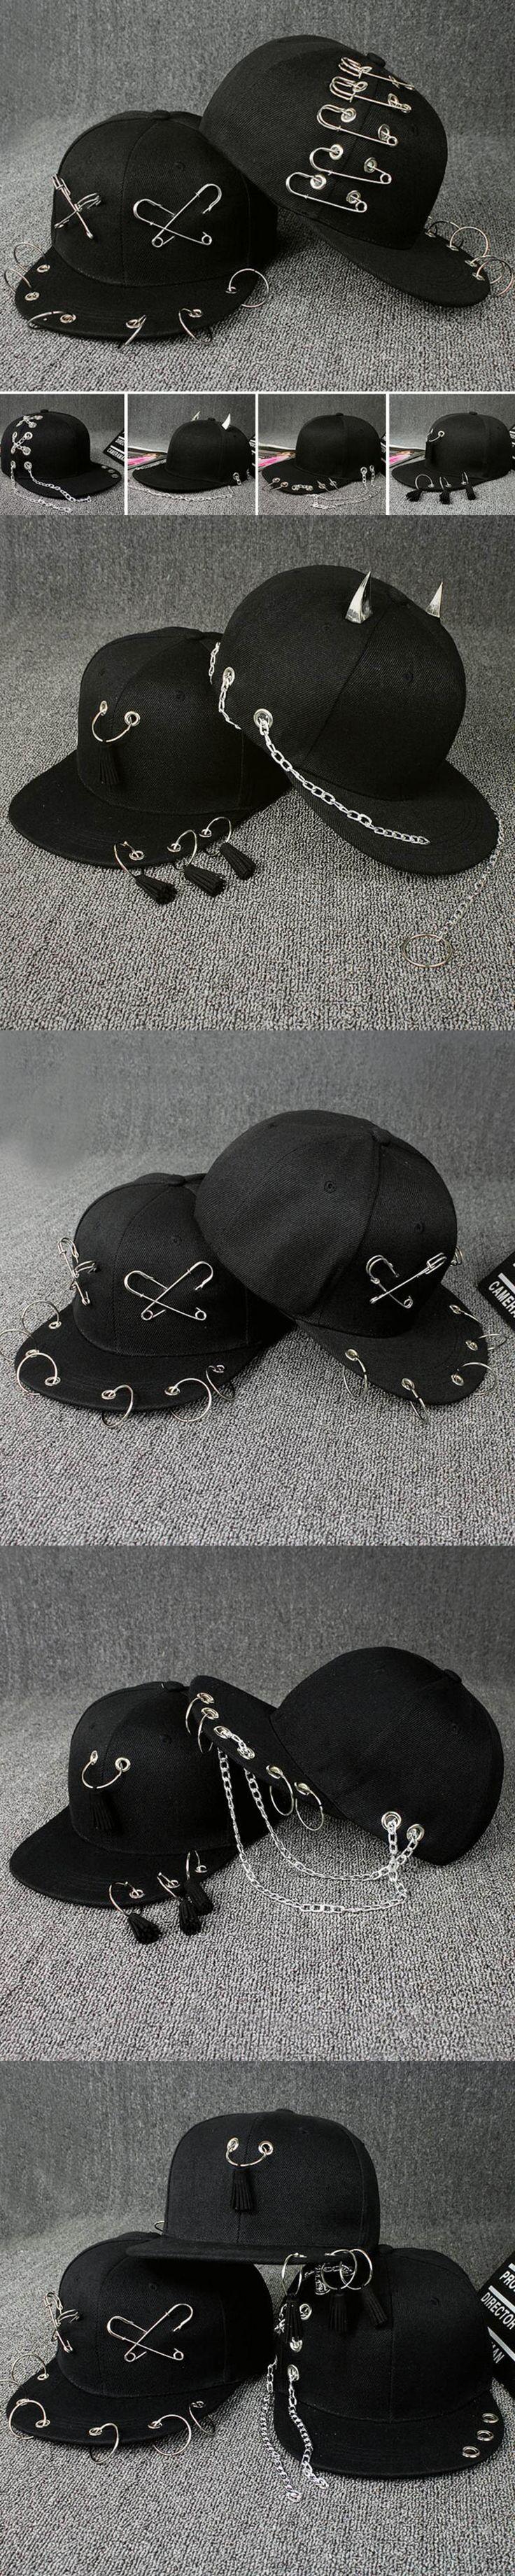 2017 Fashion Men Ring Cotton Baseball Caps Summer Women Sun Hats Metal Rings Visor Hat Male Safty Pin Curved Cap Black